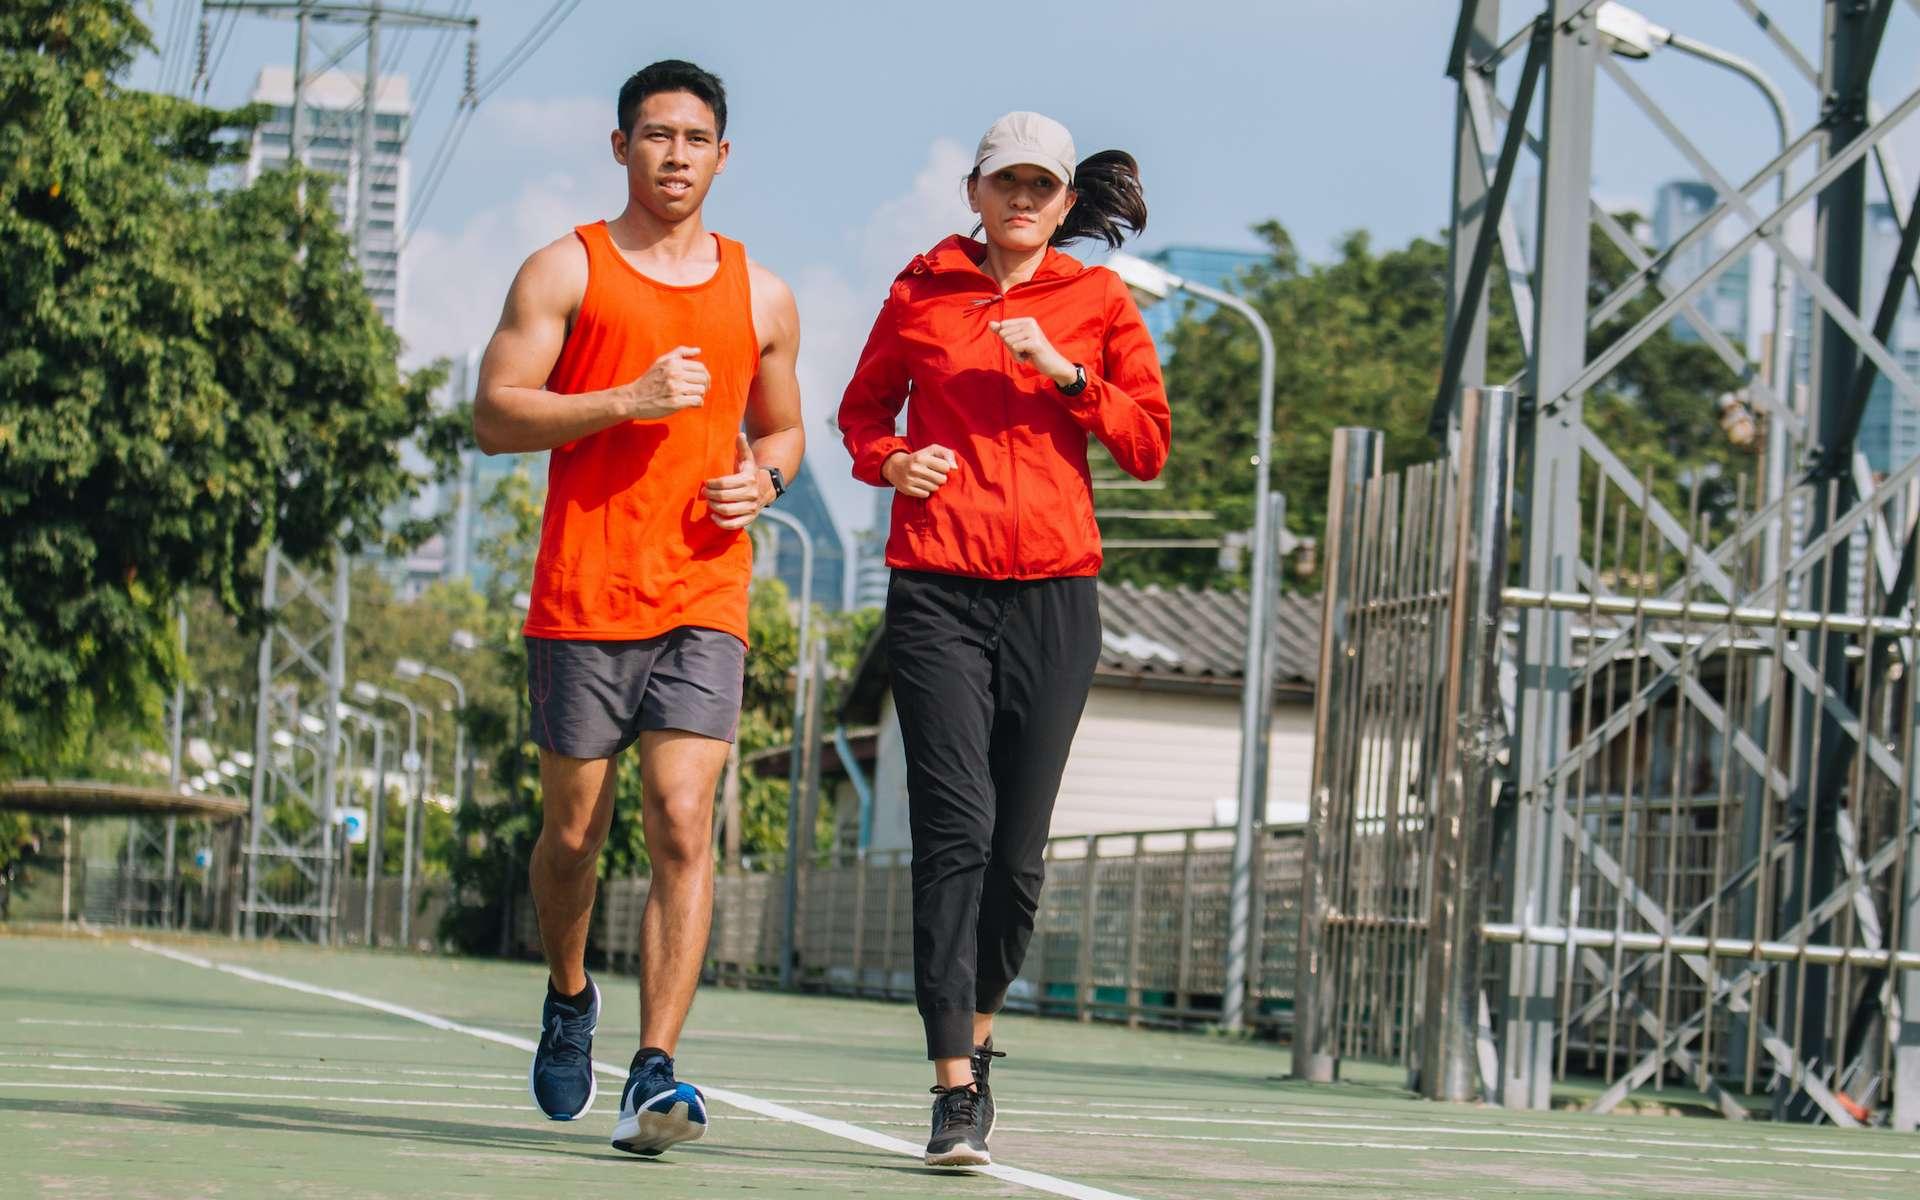 Peut-on attraper le coronavirus en faisant son jogging ? © only_kim, Adobe Stock